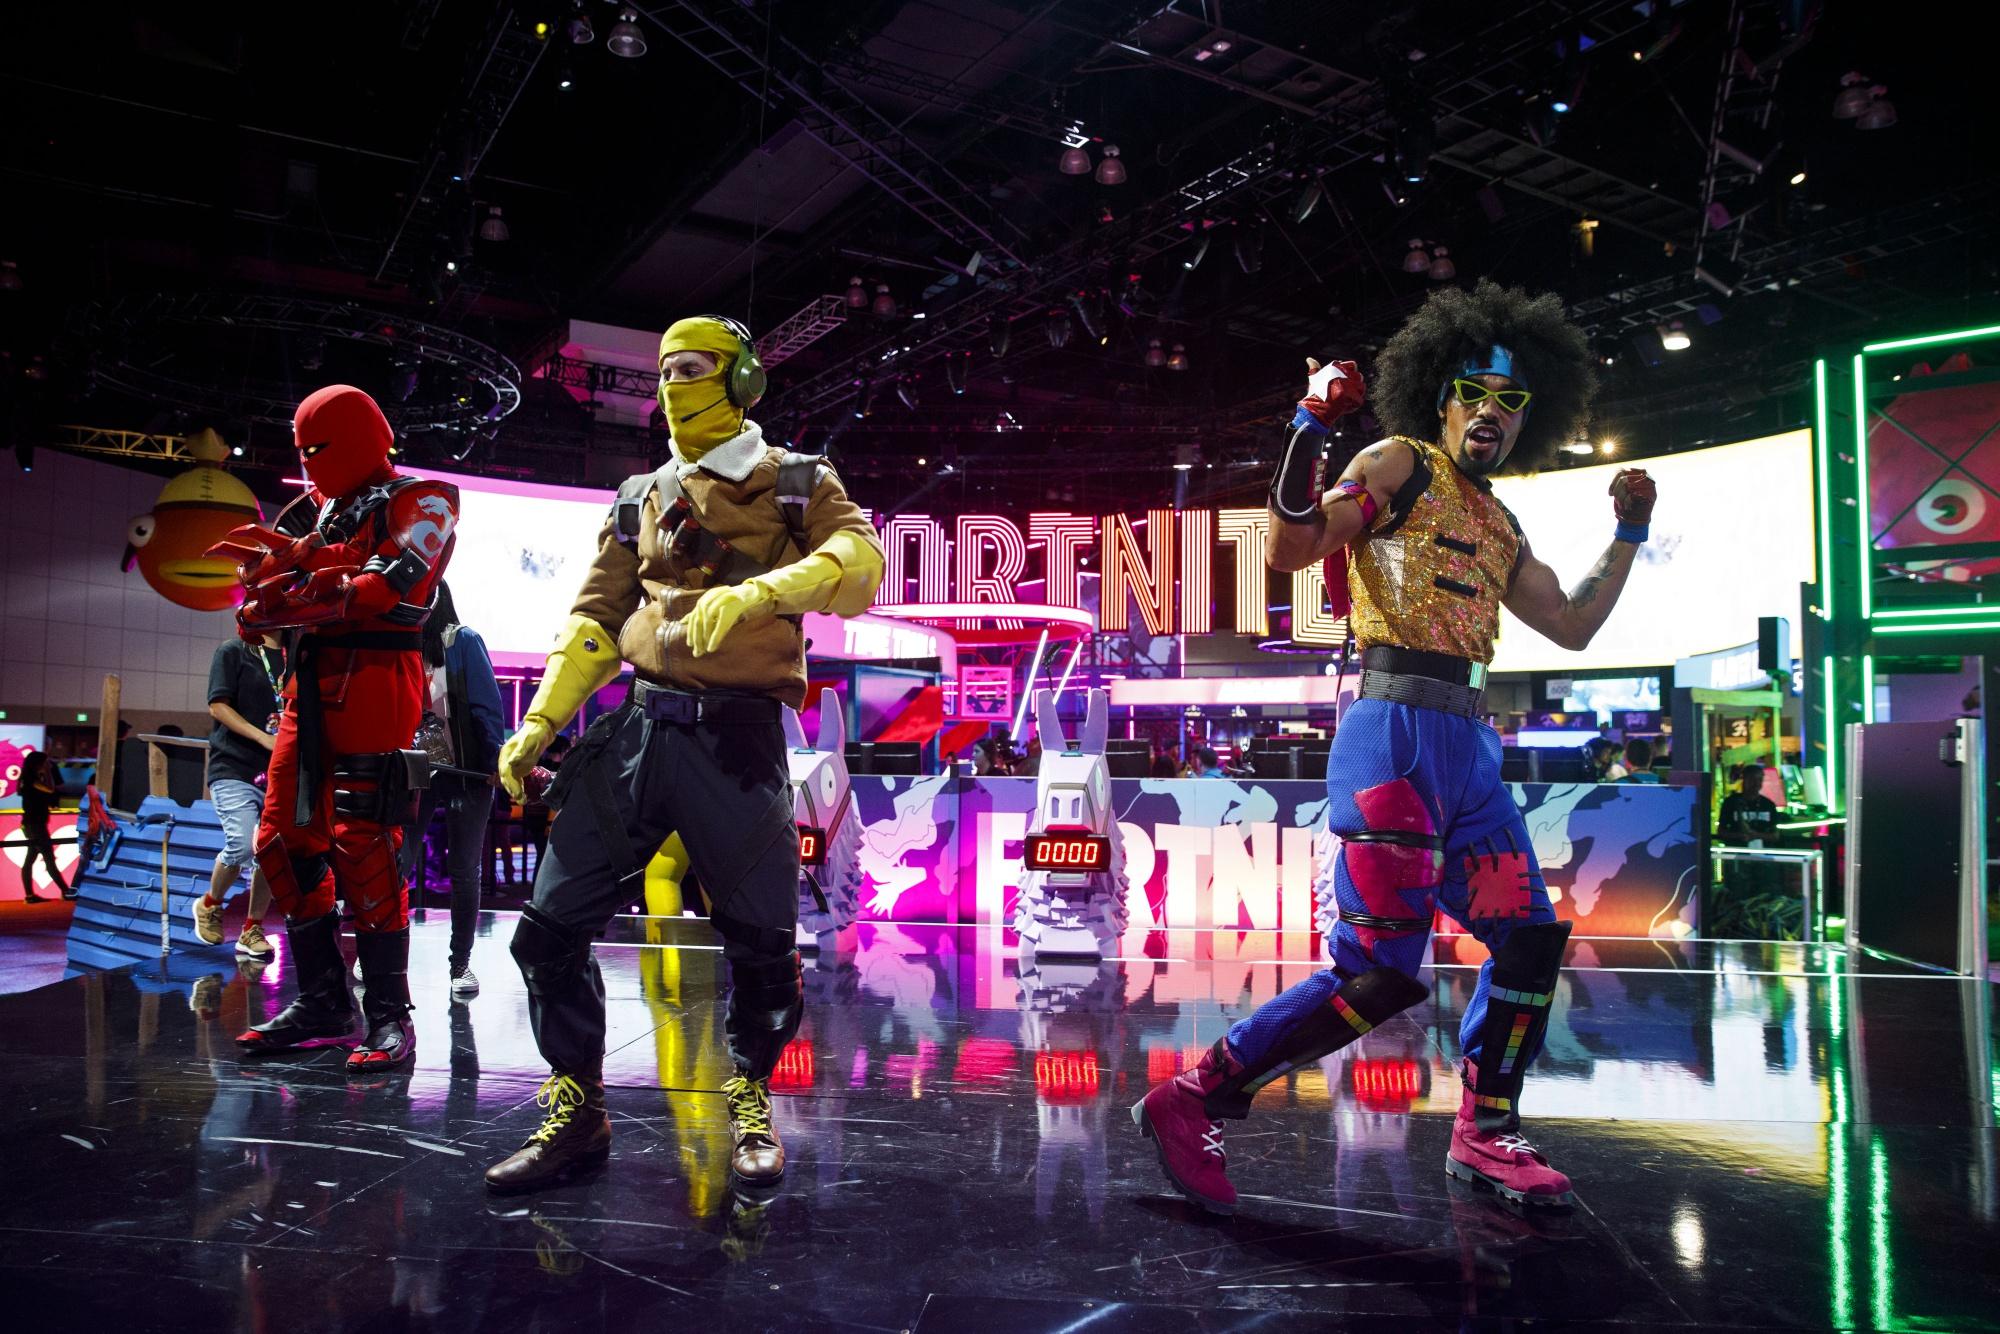 Inside The 2019 E3 Electronic Entertainment Expo